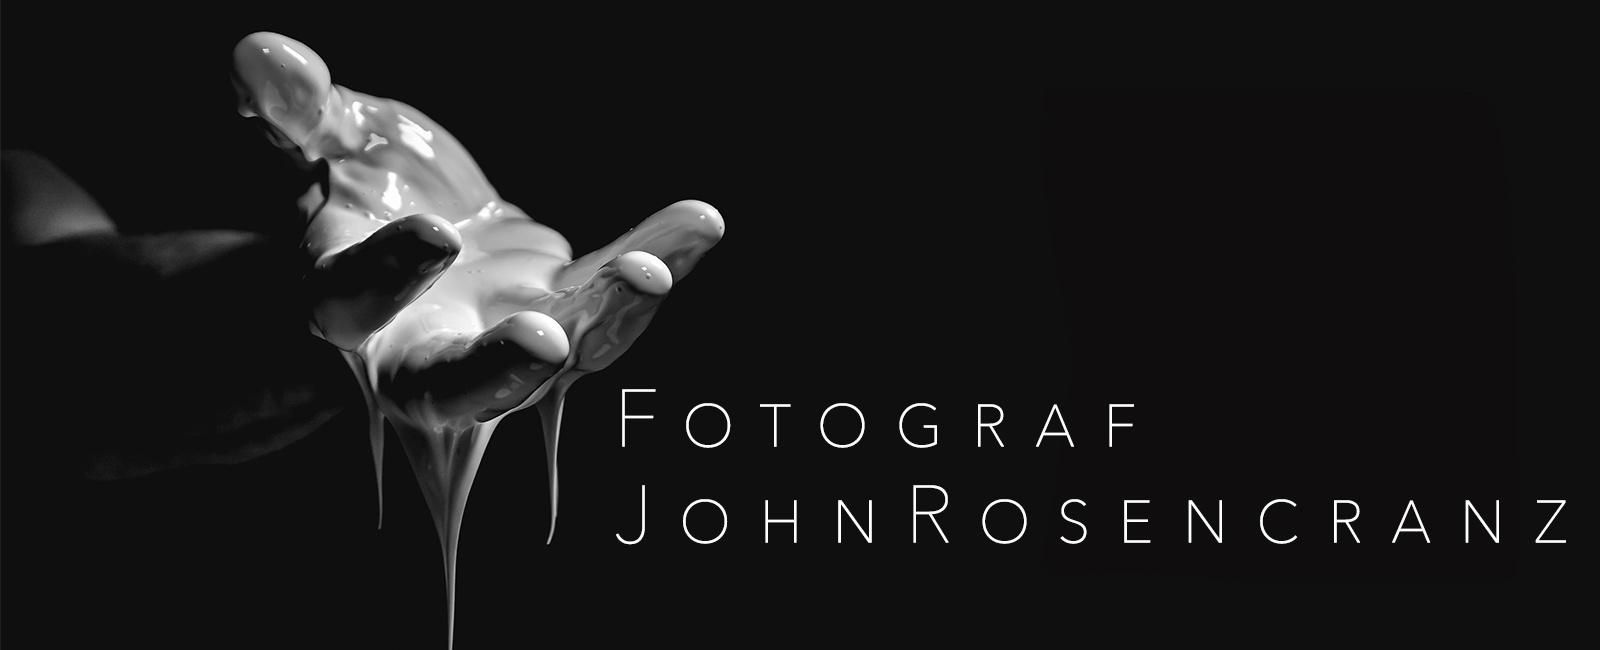 Fotograf John Rosencranz